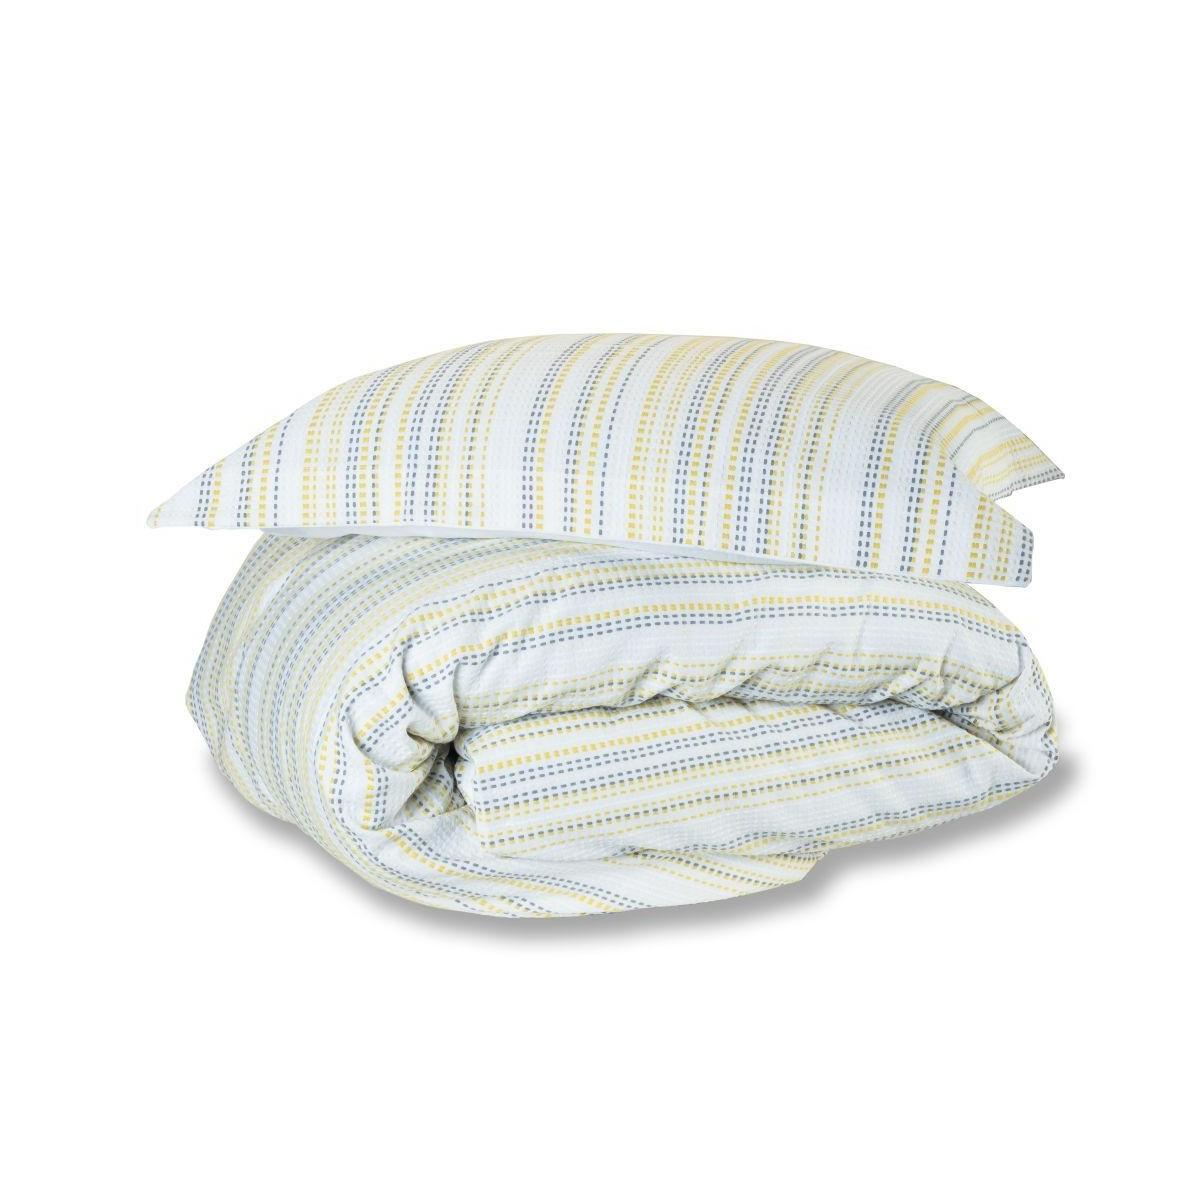 Marazion Woven Duvet Cover in Lime - Pillowcase 50x75cm